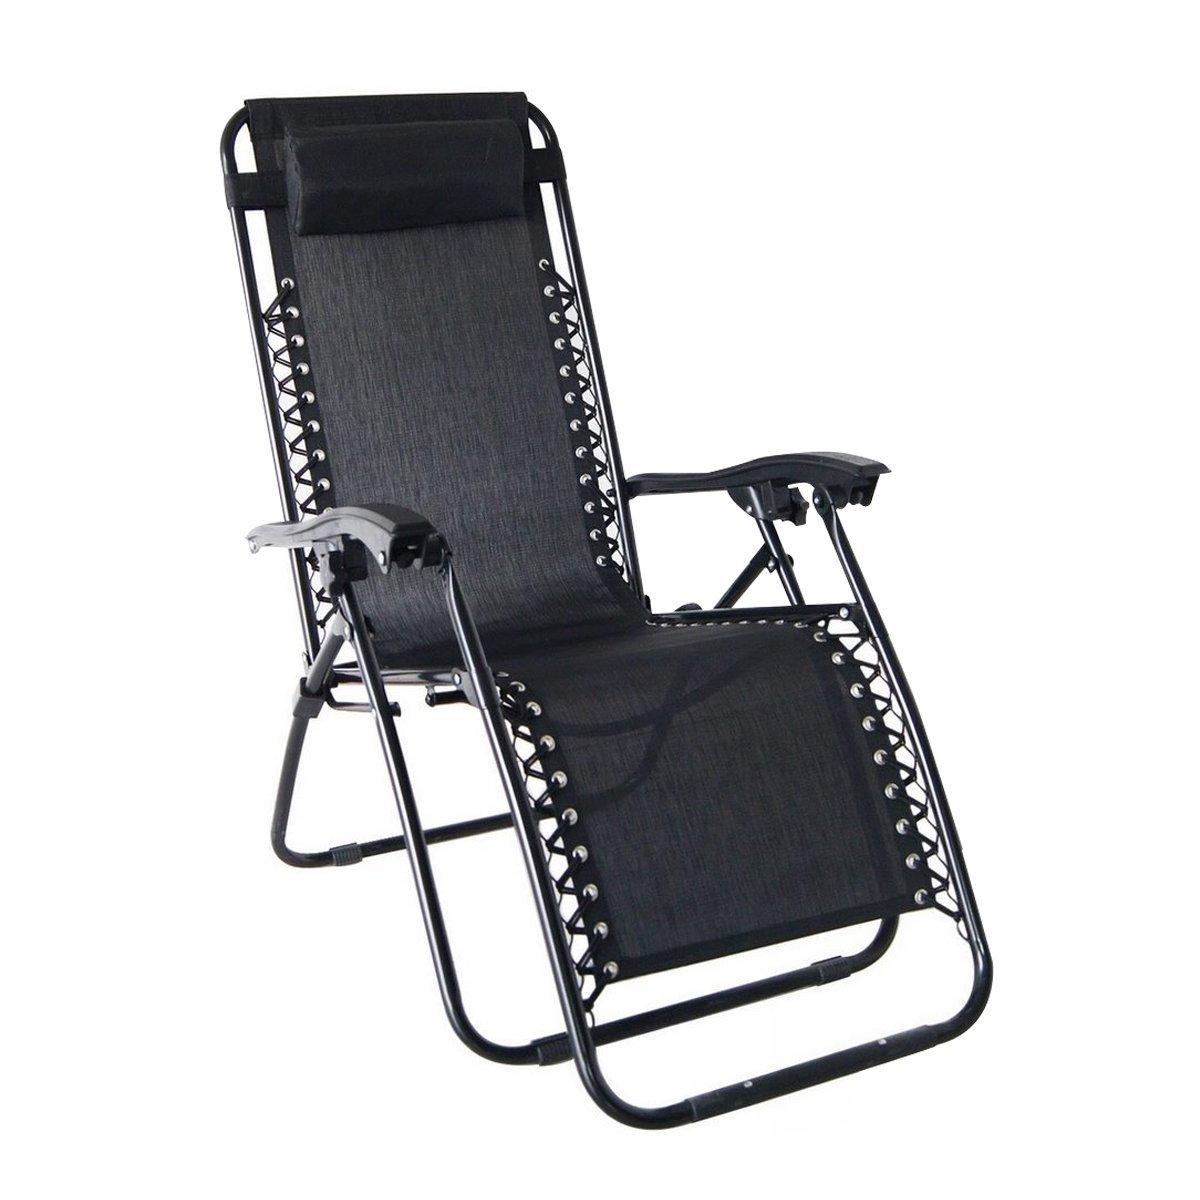 amazoncom odaof zero gravity recliner lounge patio pool chair black patio lawn u0026 garden - Zero Gravity Chair